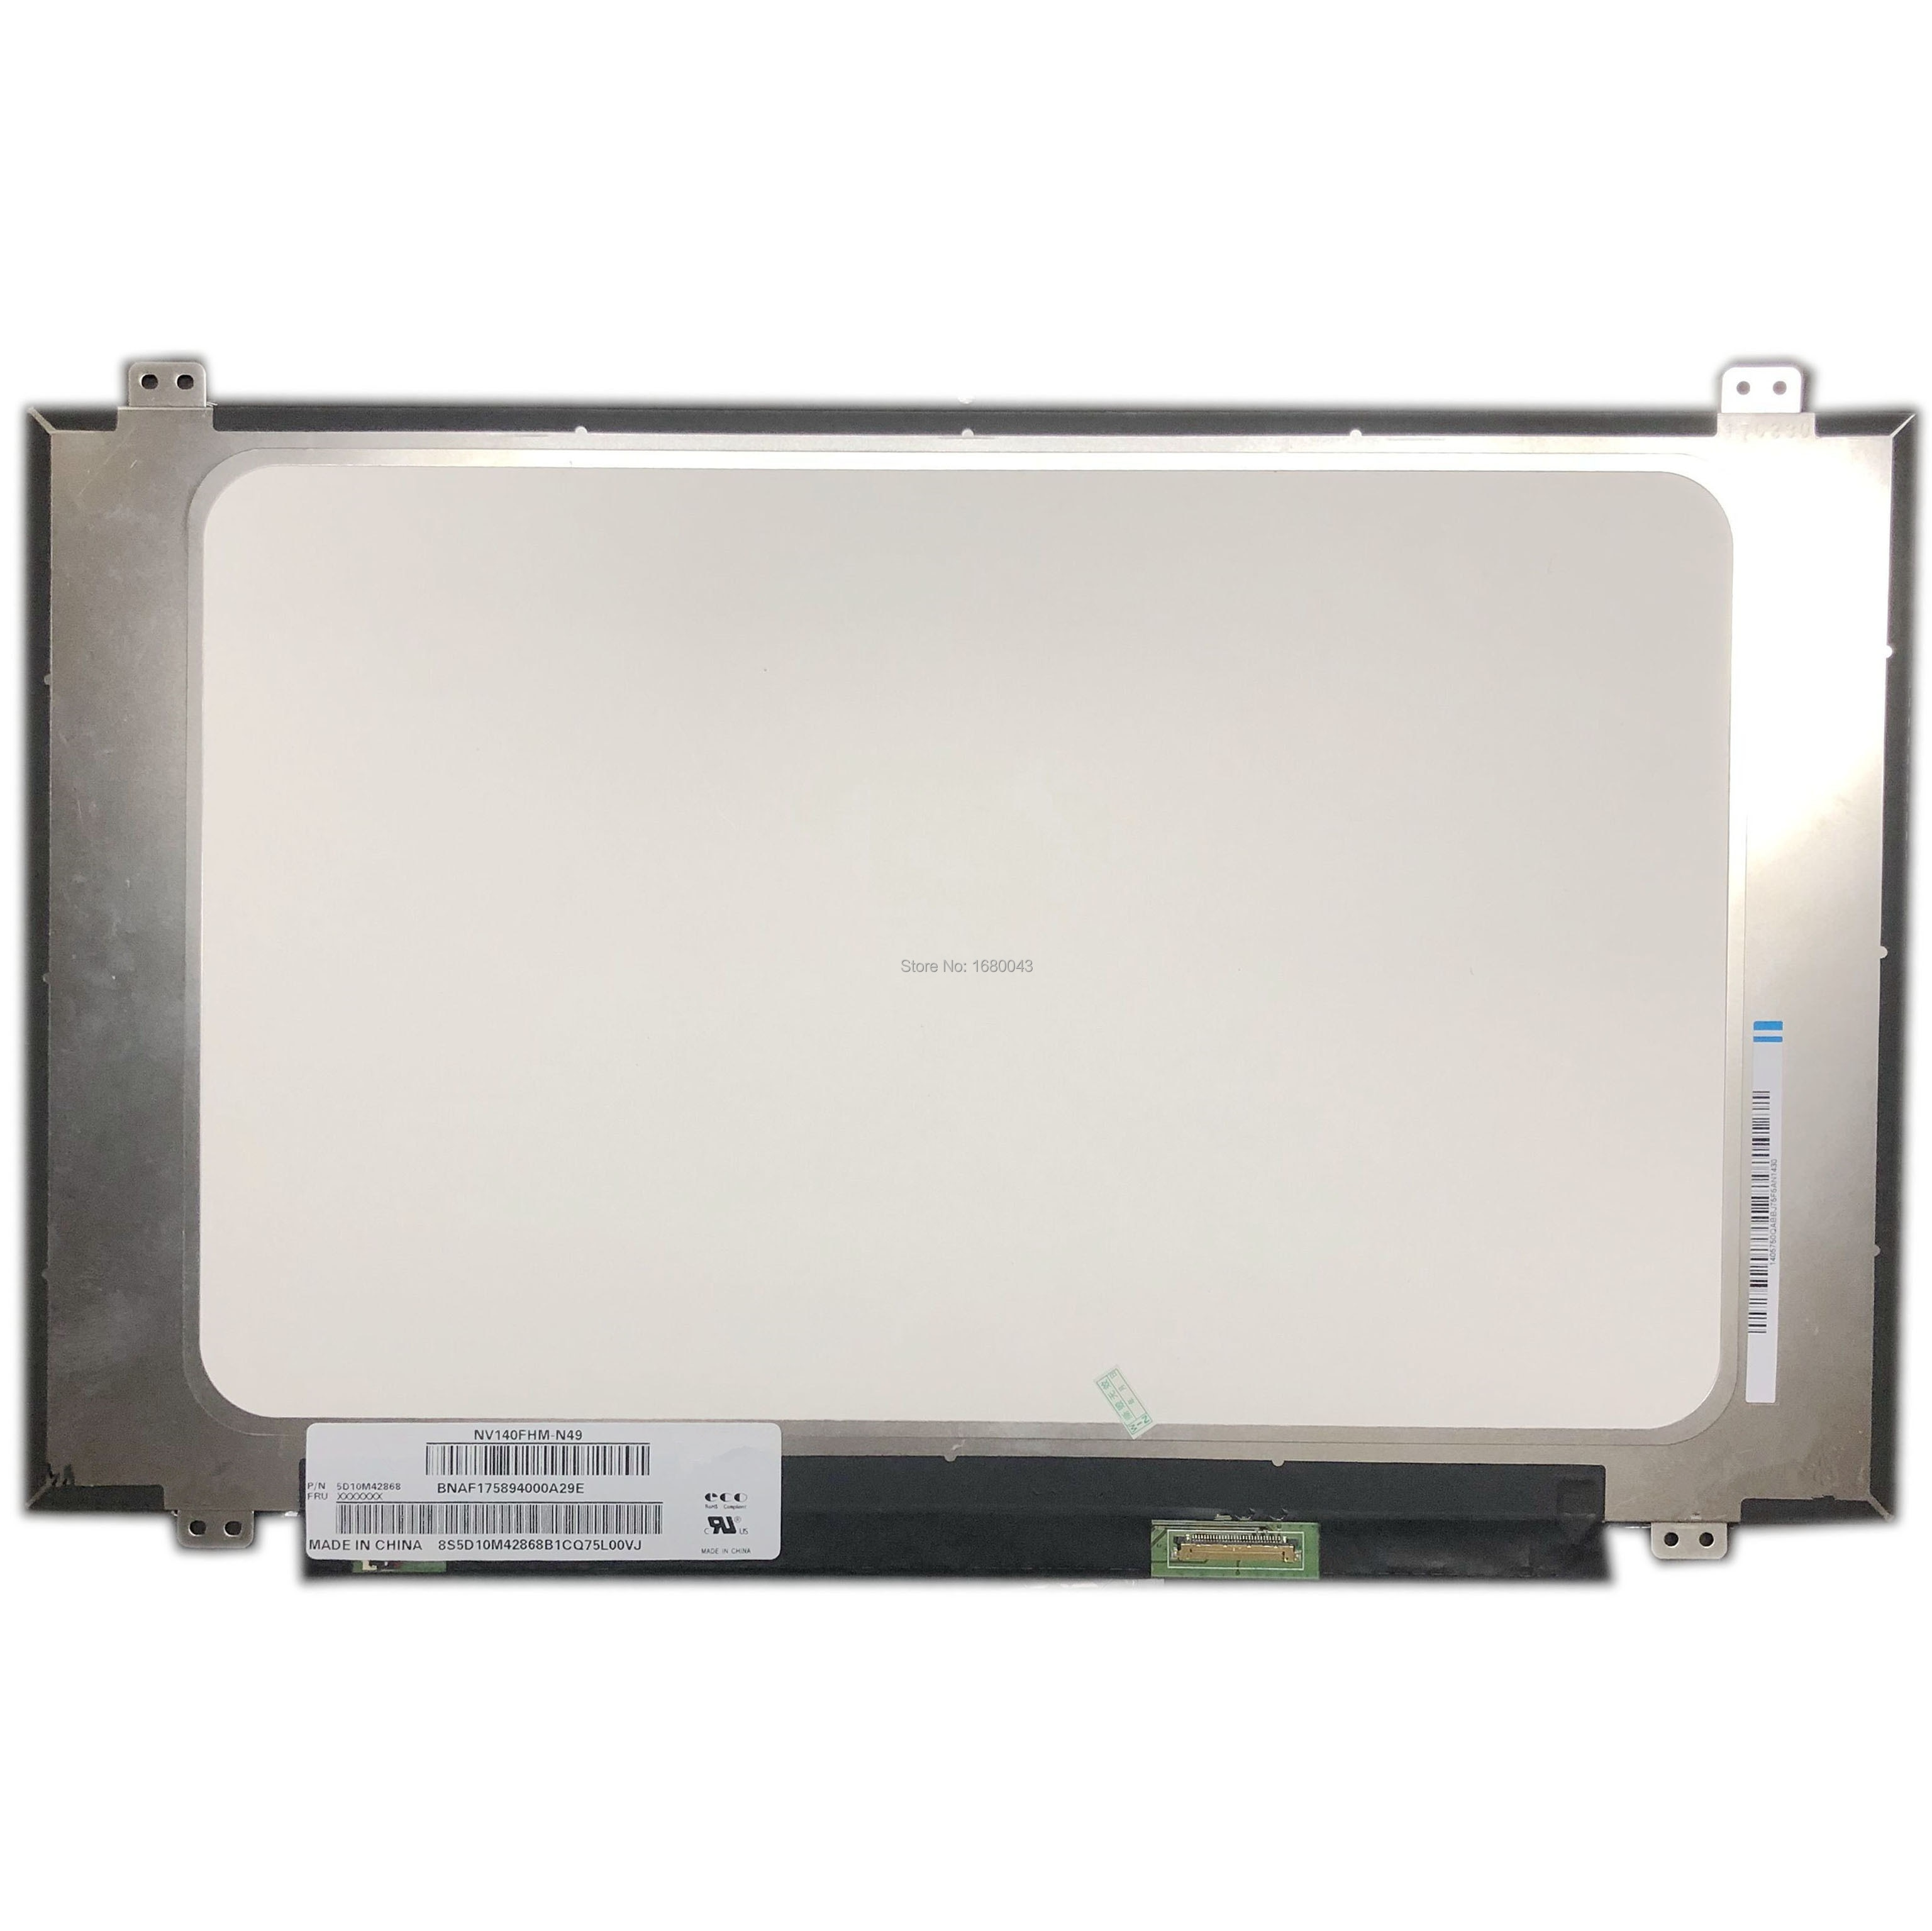 "NV140FHM-N49 pasuje do NV140FHM-N48 NV140FHM-N62 doprowadziły ekran LCD dla 14 ""IPS FHD wyświetlacz 1080P LCD EDP Panel LED"